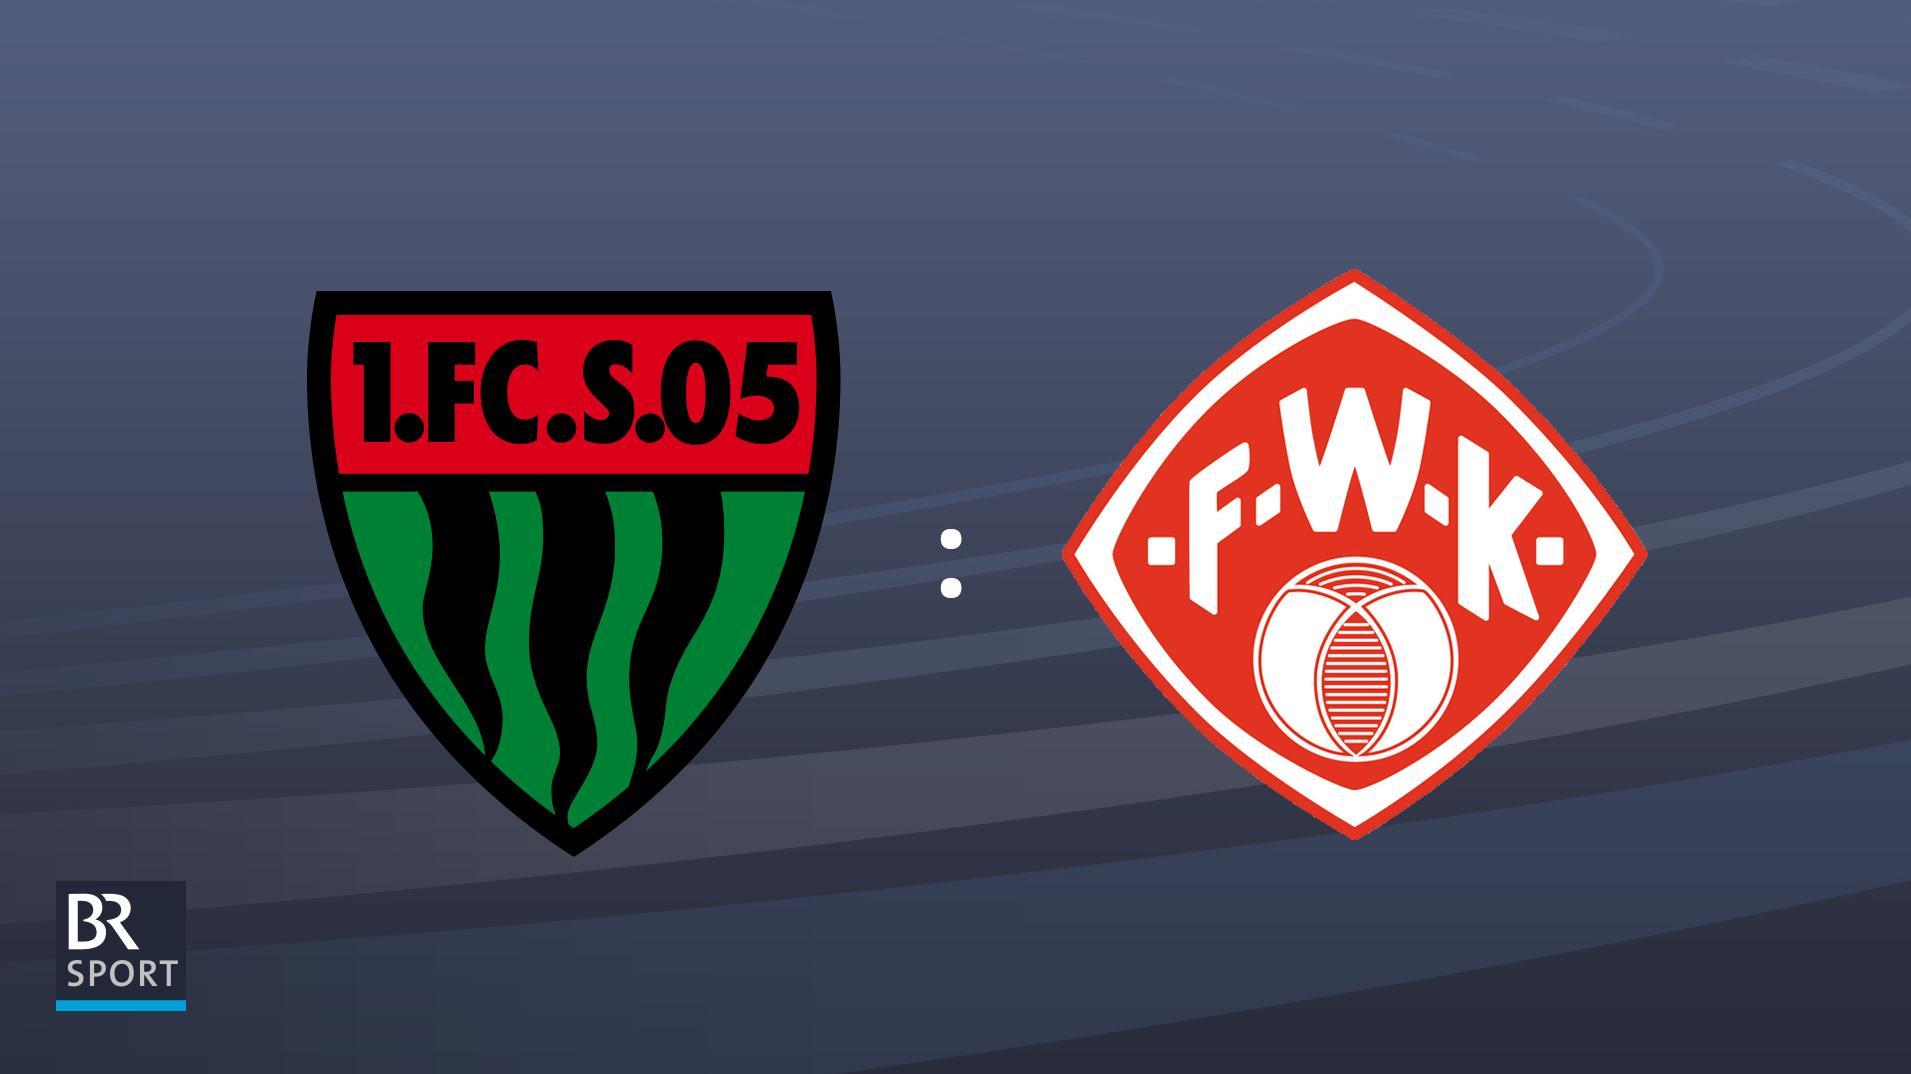 Partie FC Schweinfurt 05 gegen Würzburger Kickers